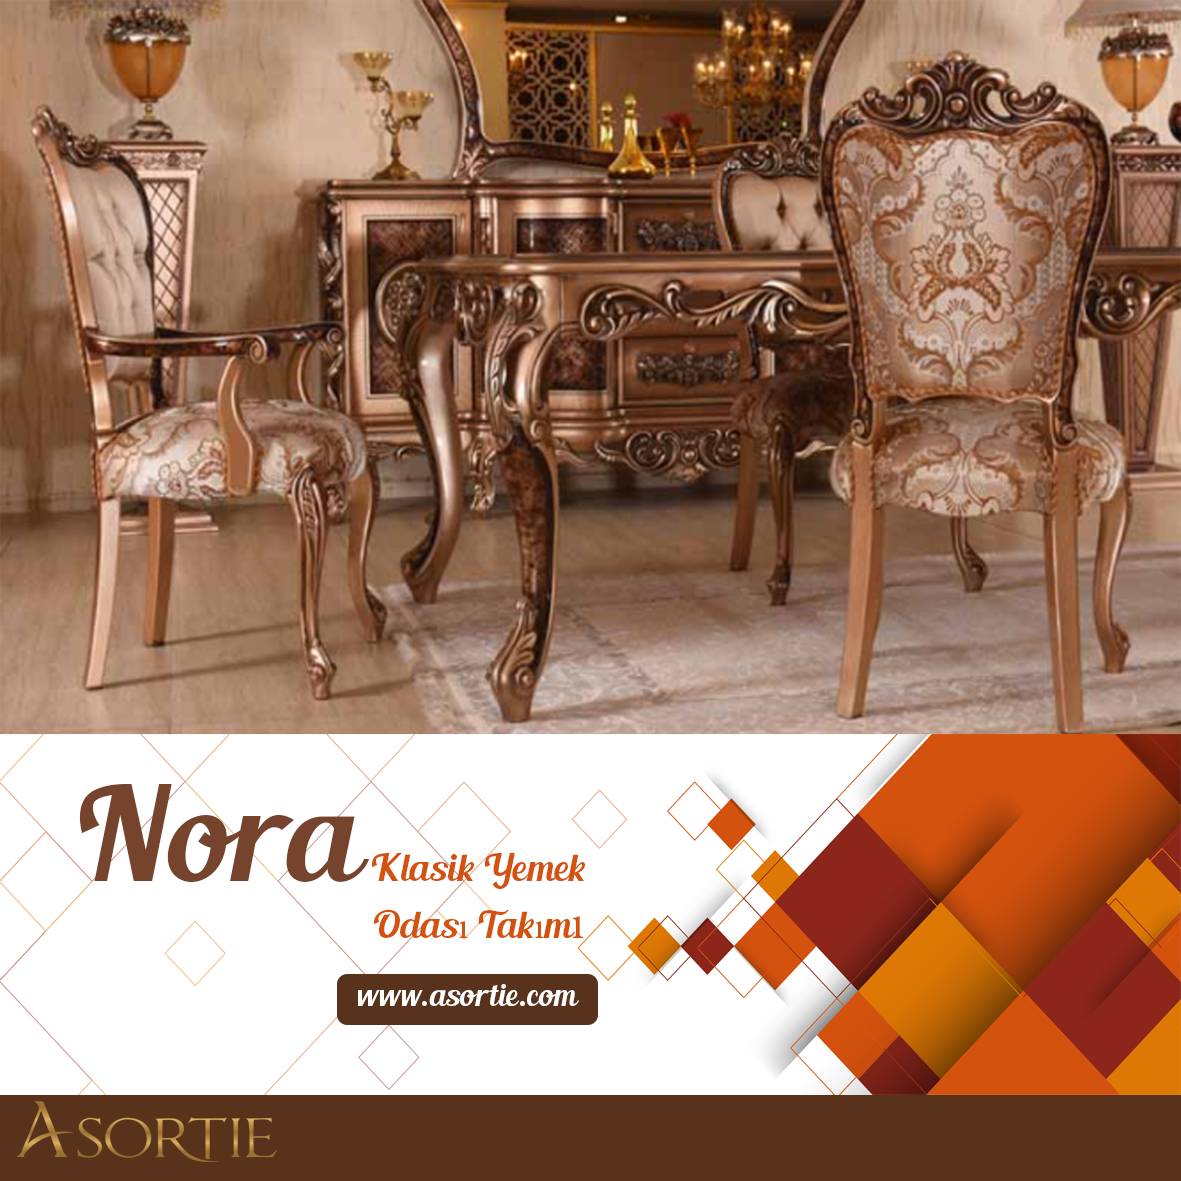 Nora Klasik Yemek Odas Takm Classic Dining Room Team Cezayir Bahreyn